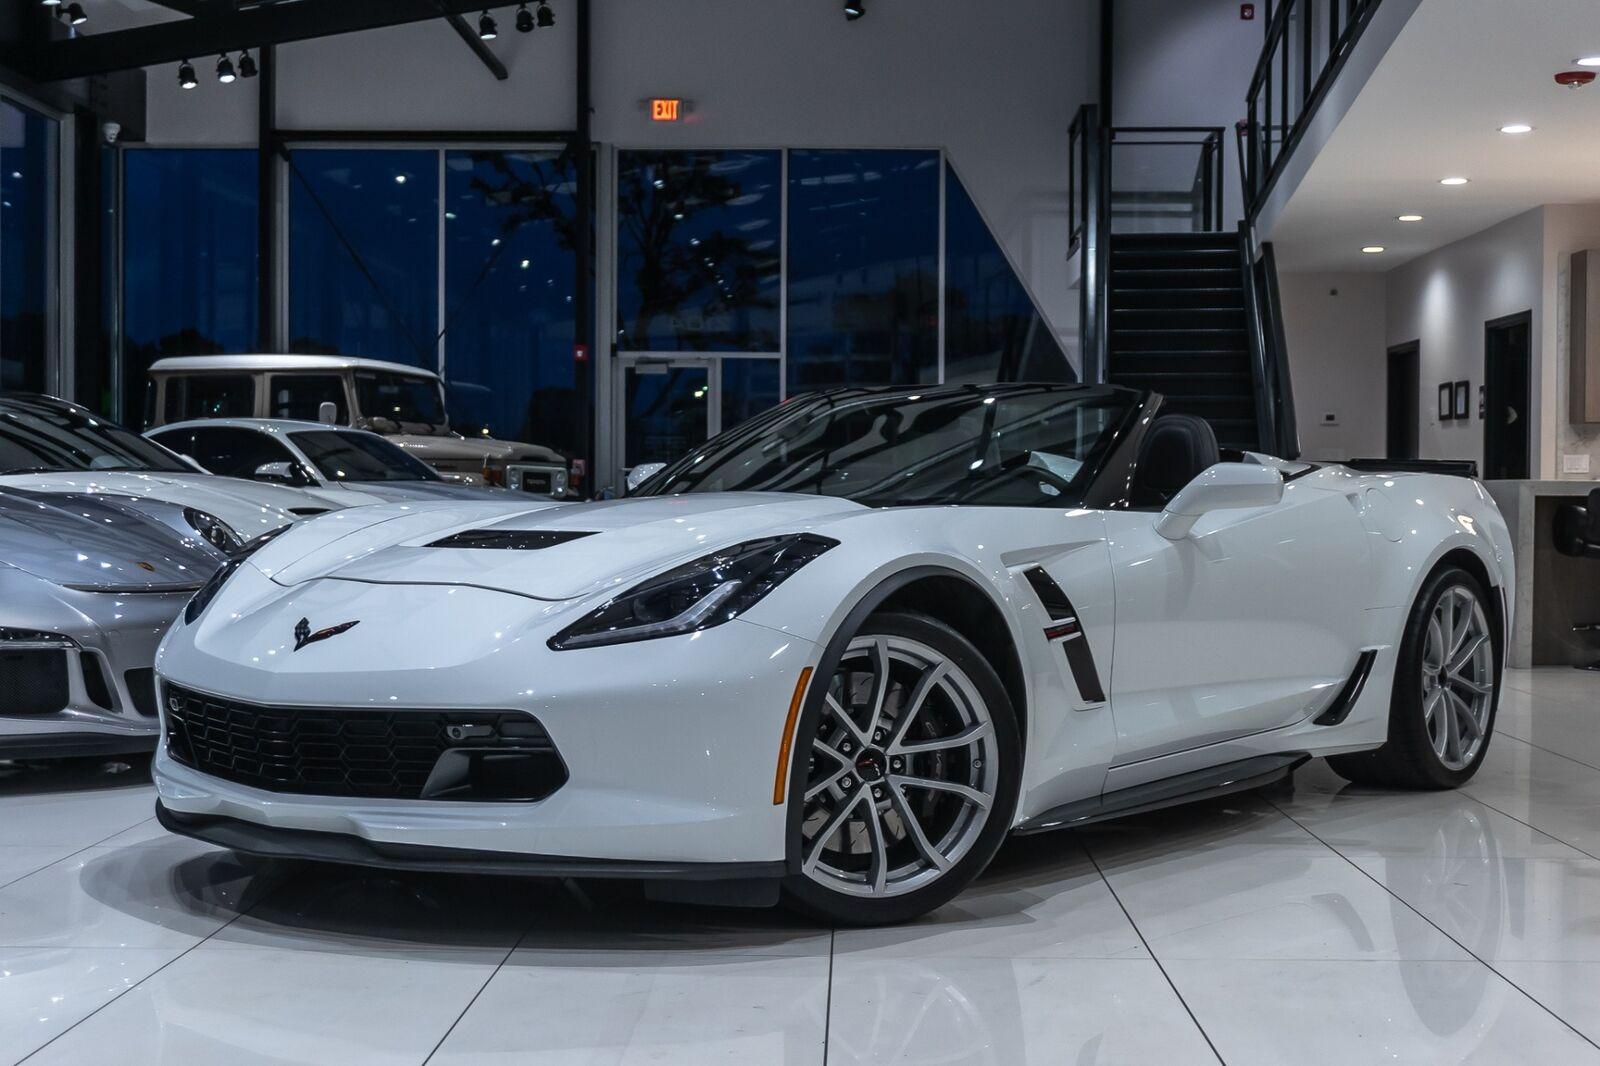 2019 White Chevrolet Corvette Convertible 2LT | C7 Corvette Photo 2